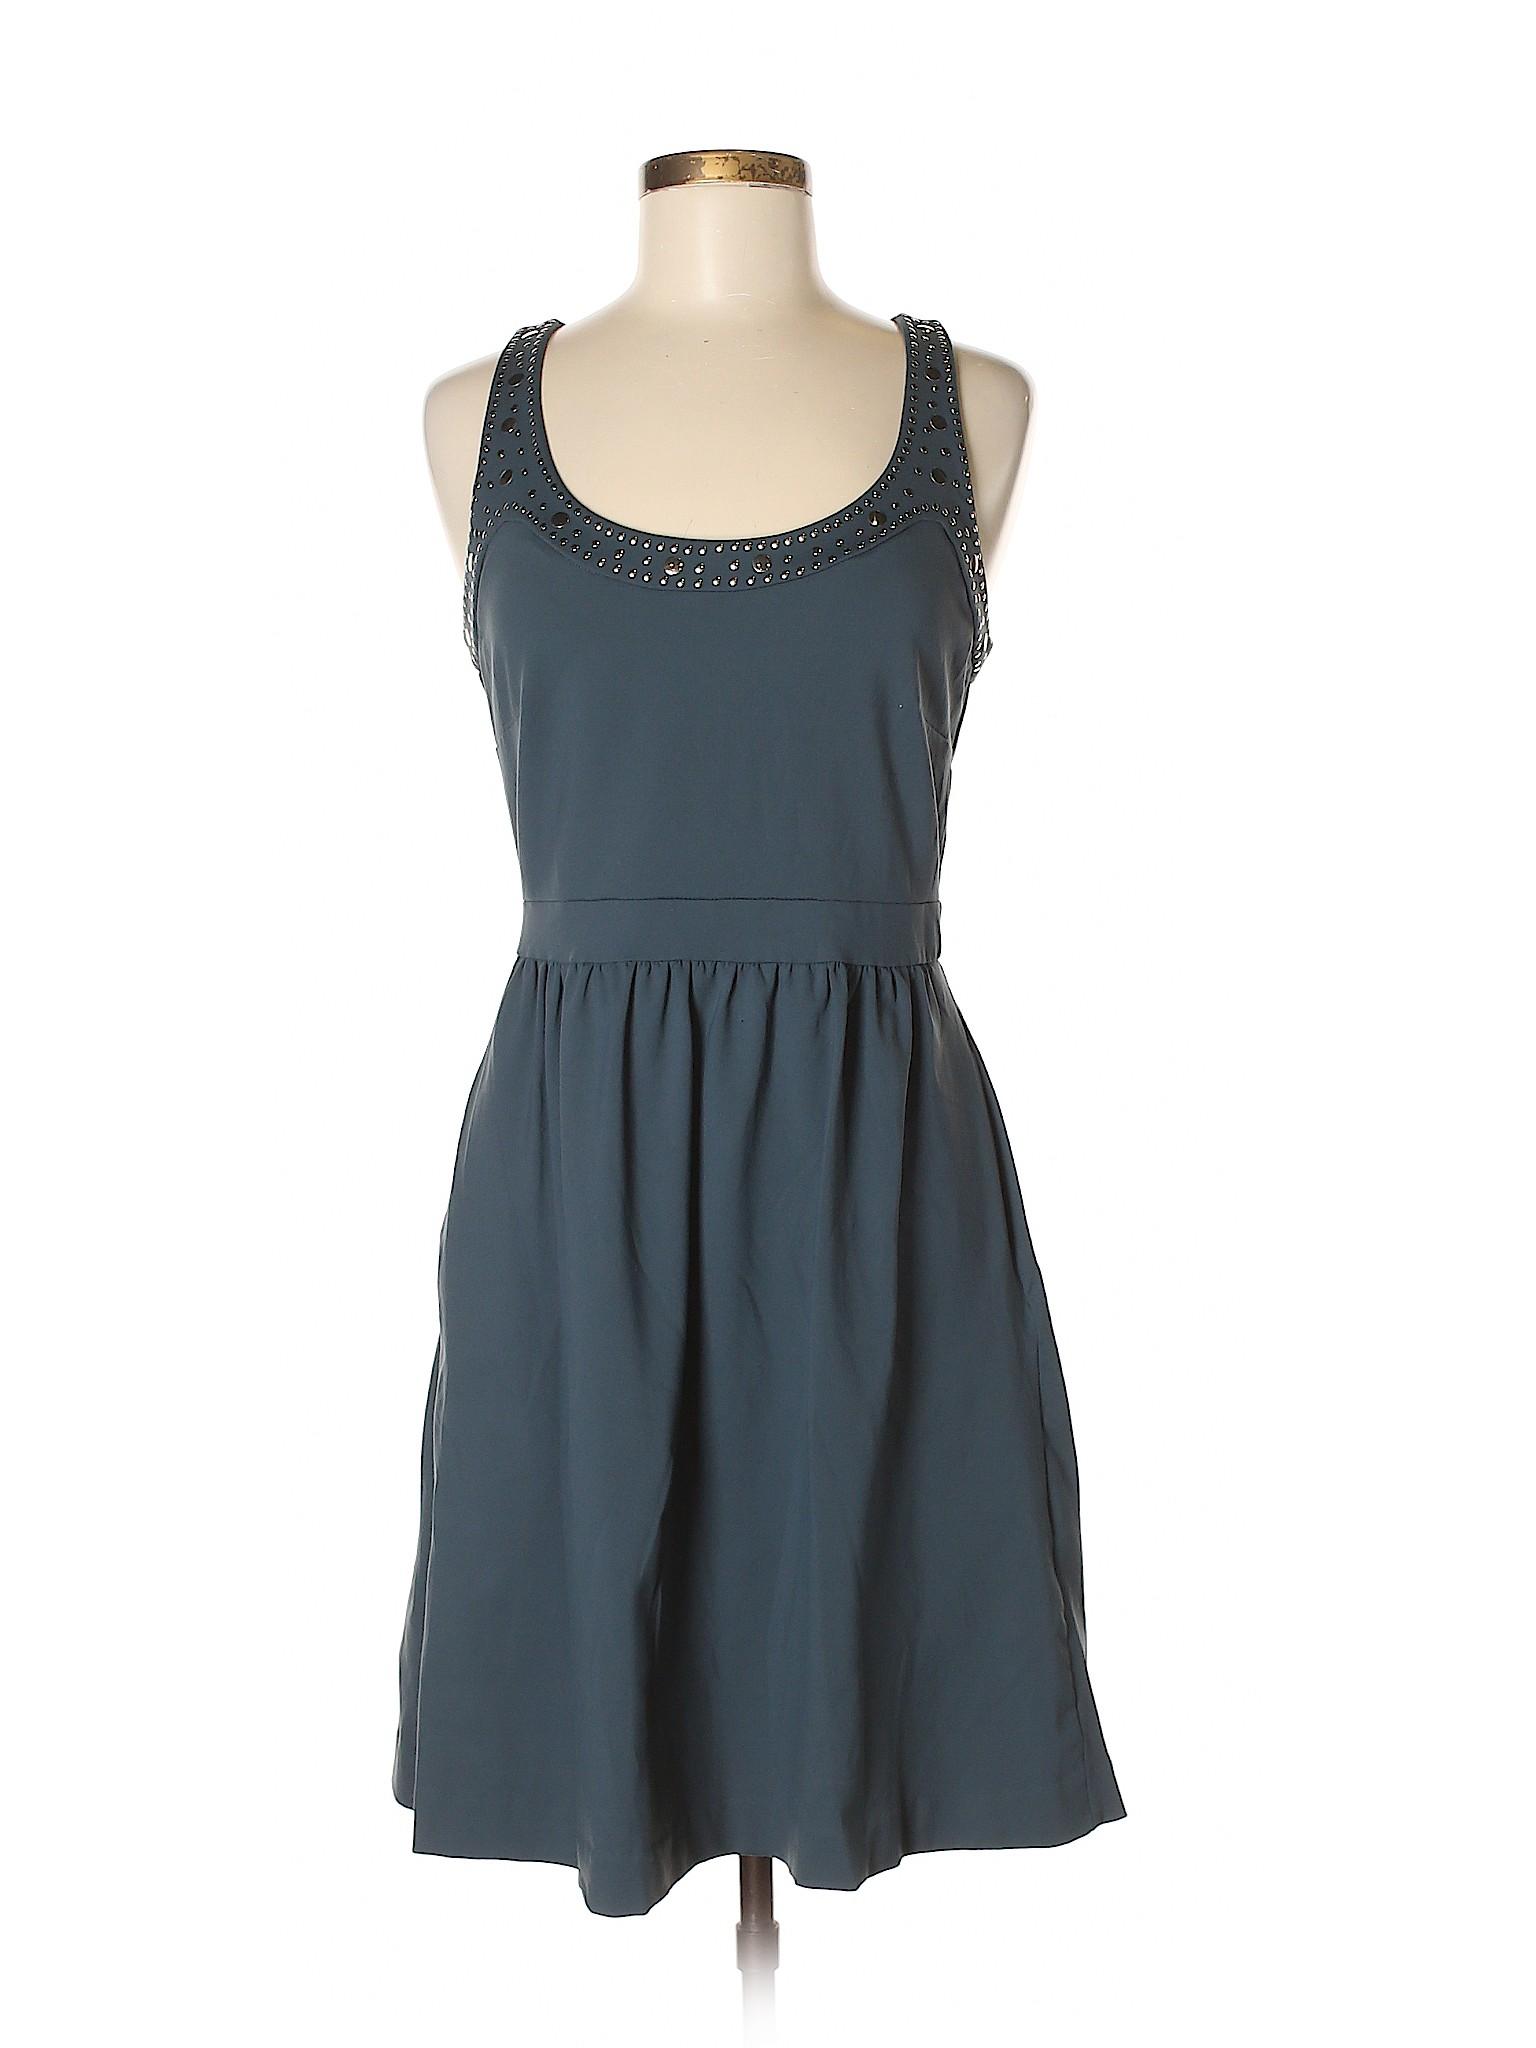 Rowley Dress Cynthia for Marshalls winter Boutique Casual U0wAqnB